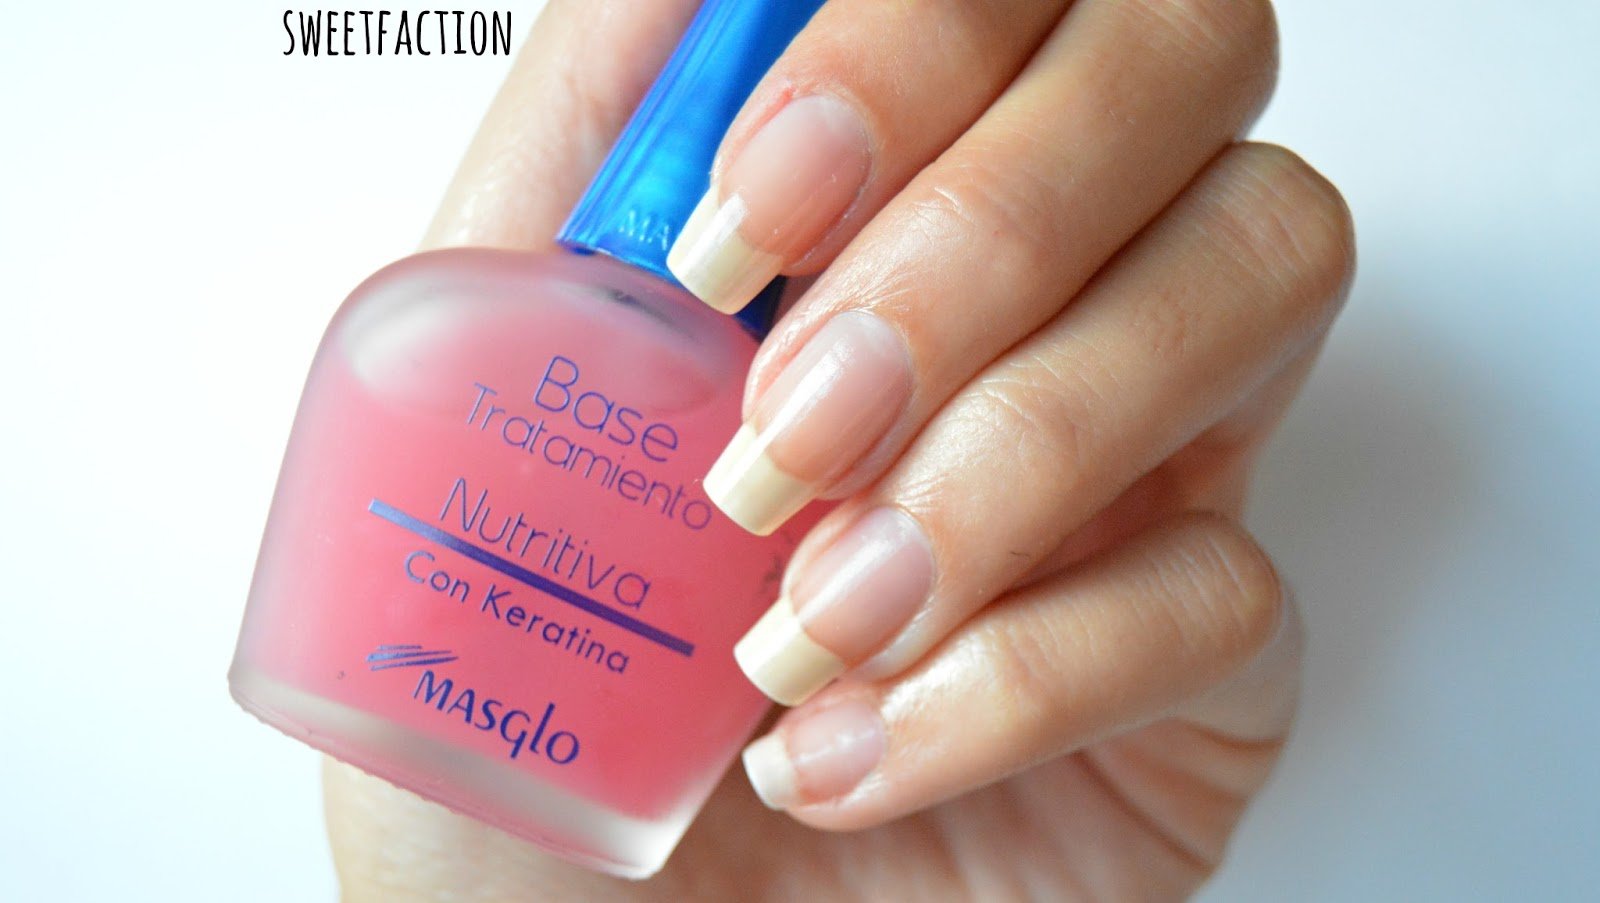 Sweetfaction: MIS ESENCIALES DE MASGLO